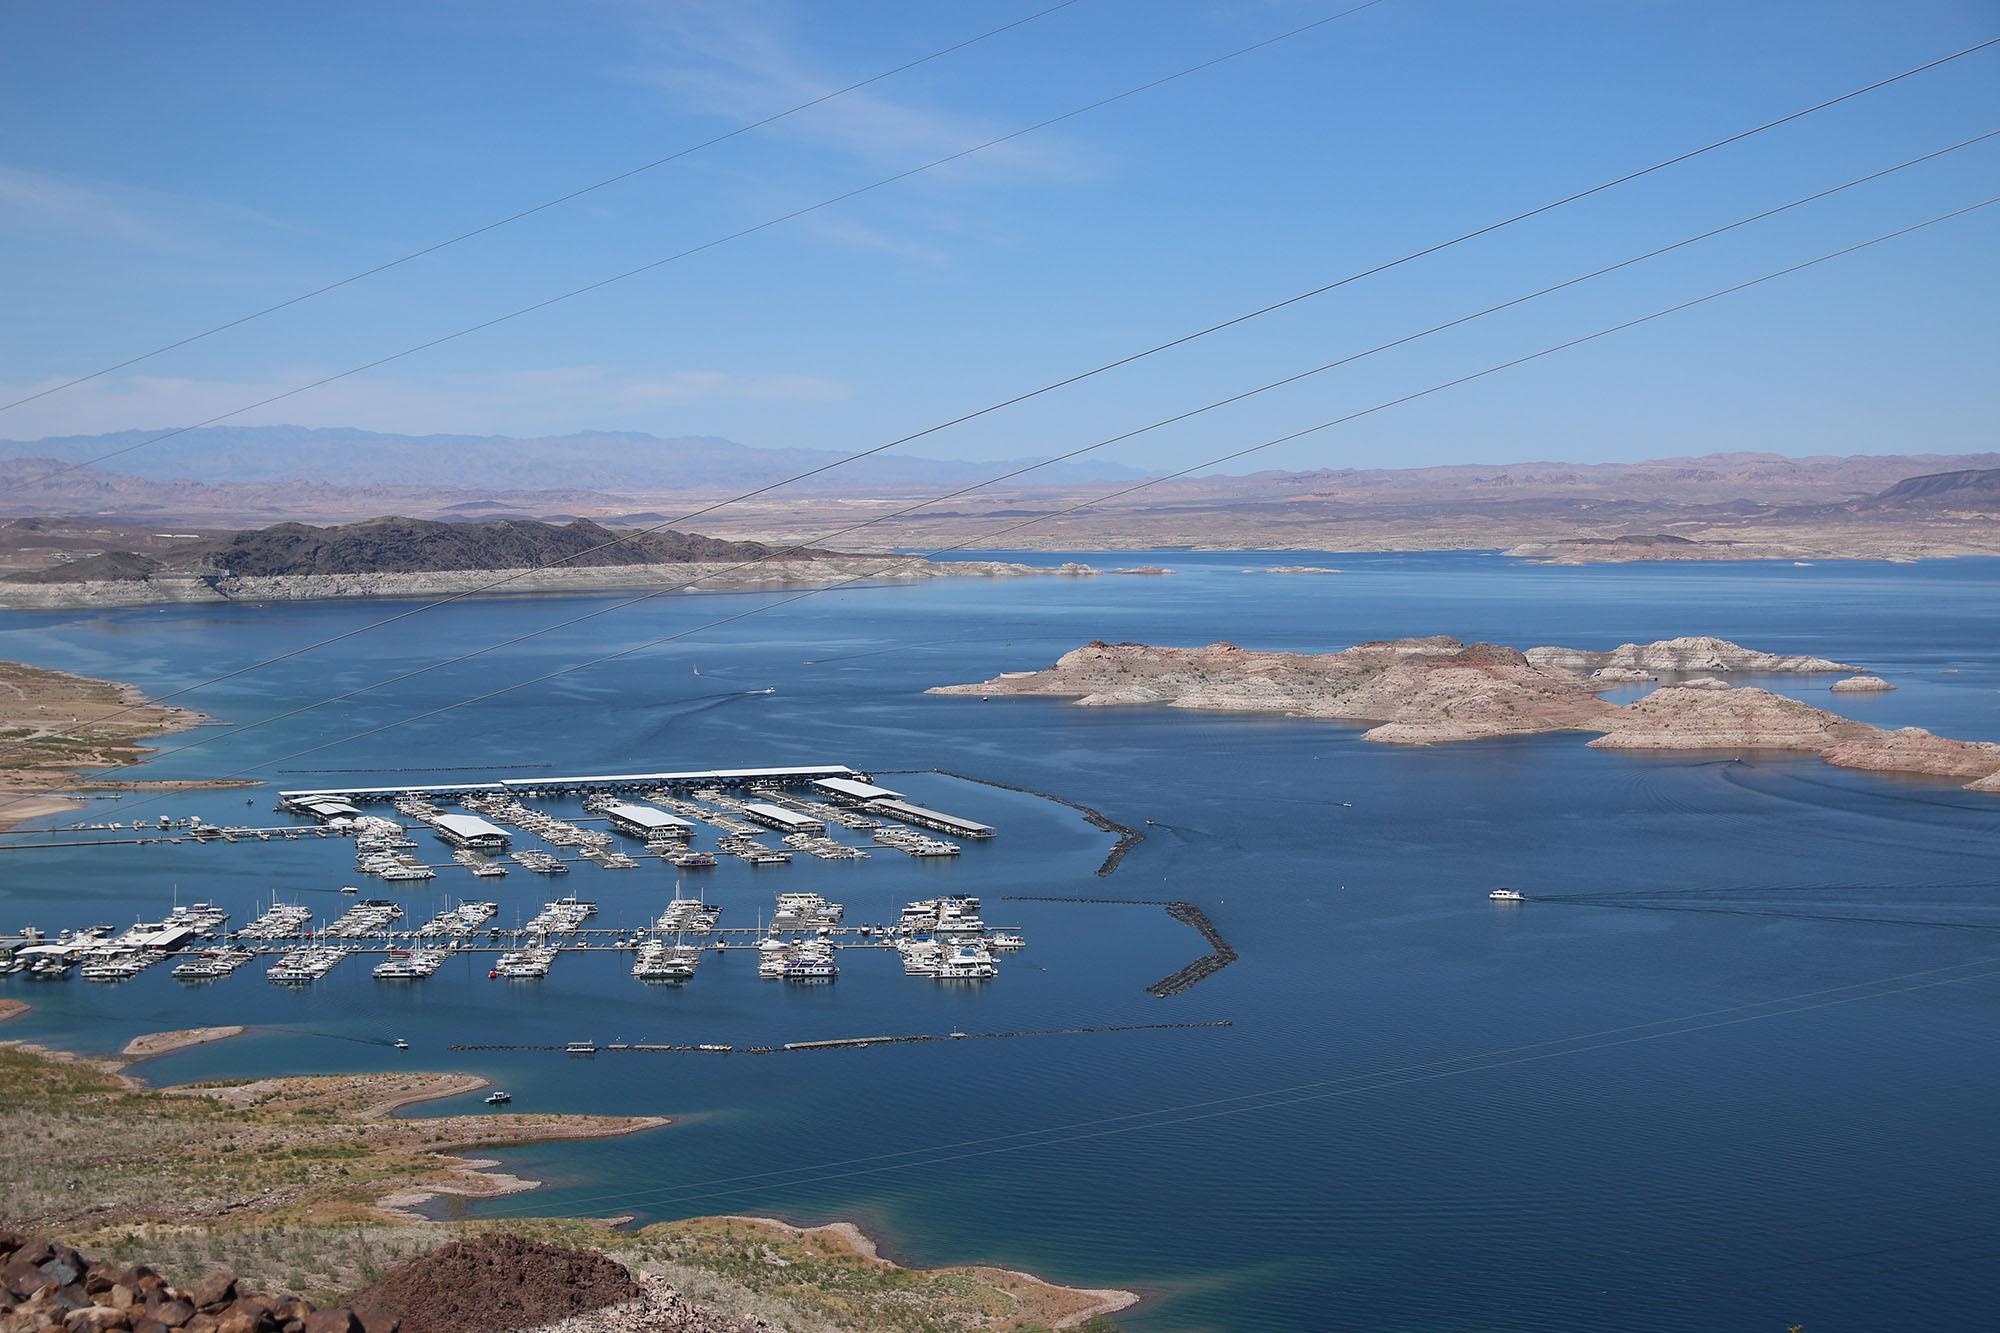 IMG_2032 hoover sjön x